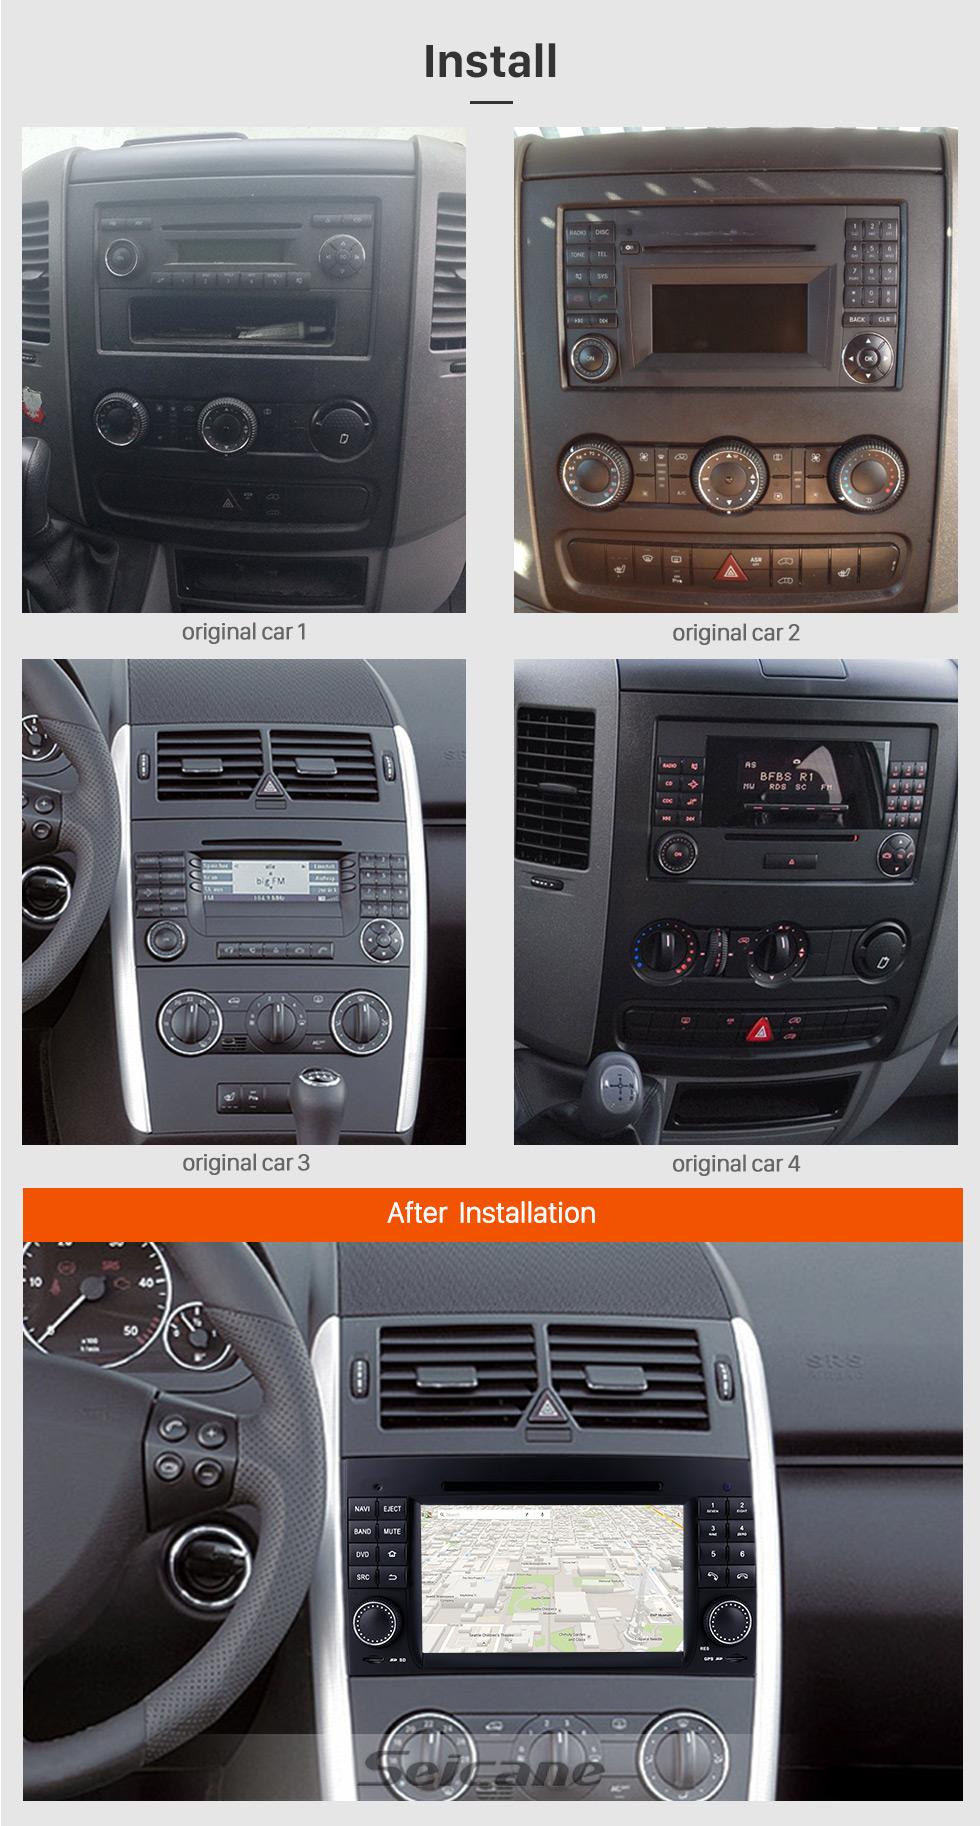 Seicane 2006-2012 Mercedes Benz Viano Vito W639 Android 8.0 GPS Navigationssystem Radio DVD Player Touch Screen TV HD 1080P Video Rückfahr kamera Lenkrad-Steuerung USB SD Bluetooth WiFi